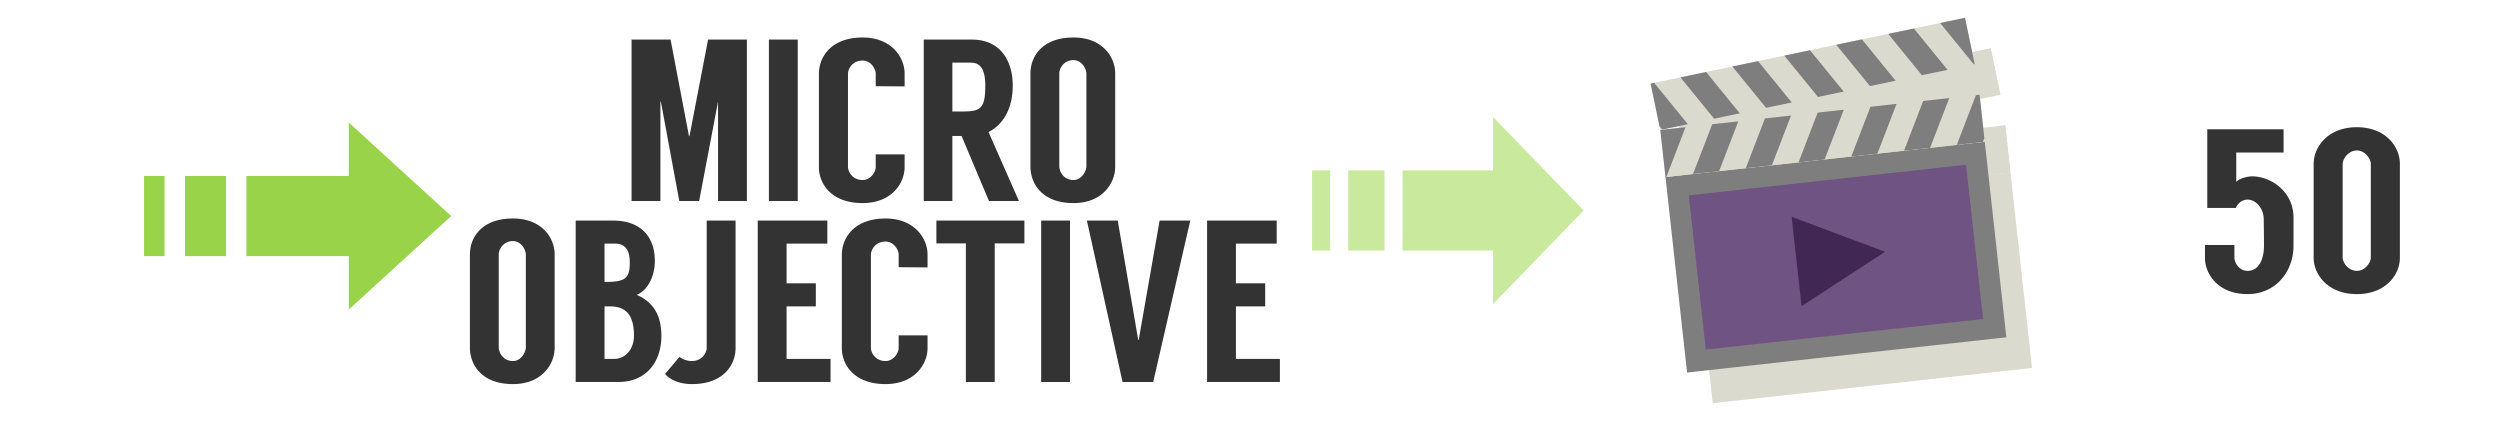 Micro Objective - Media - 50